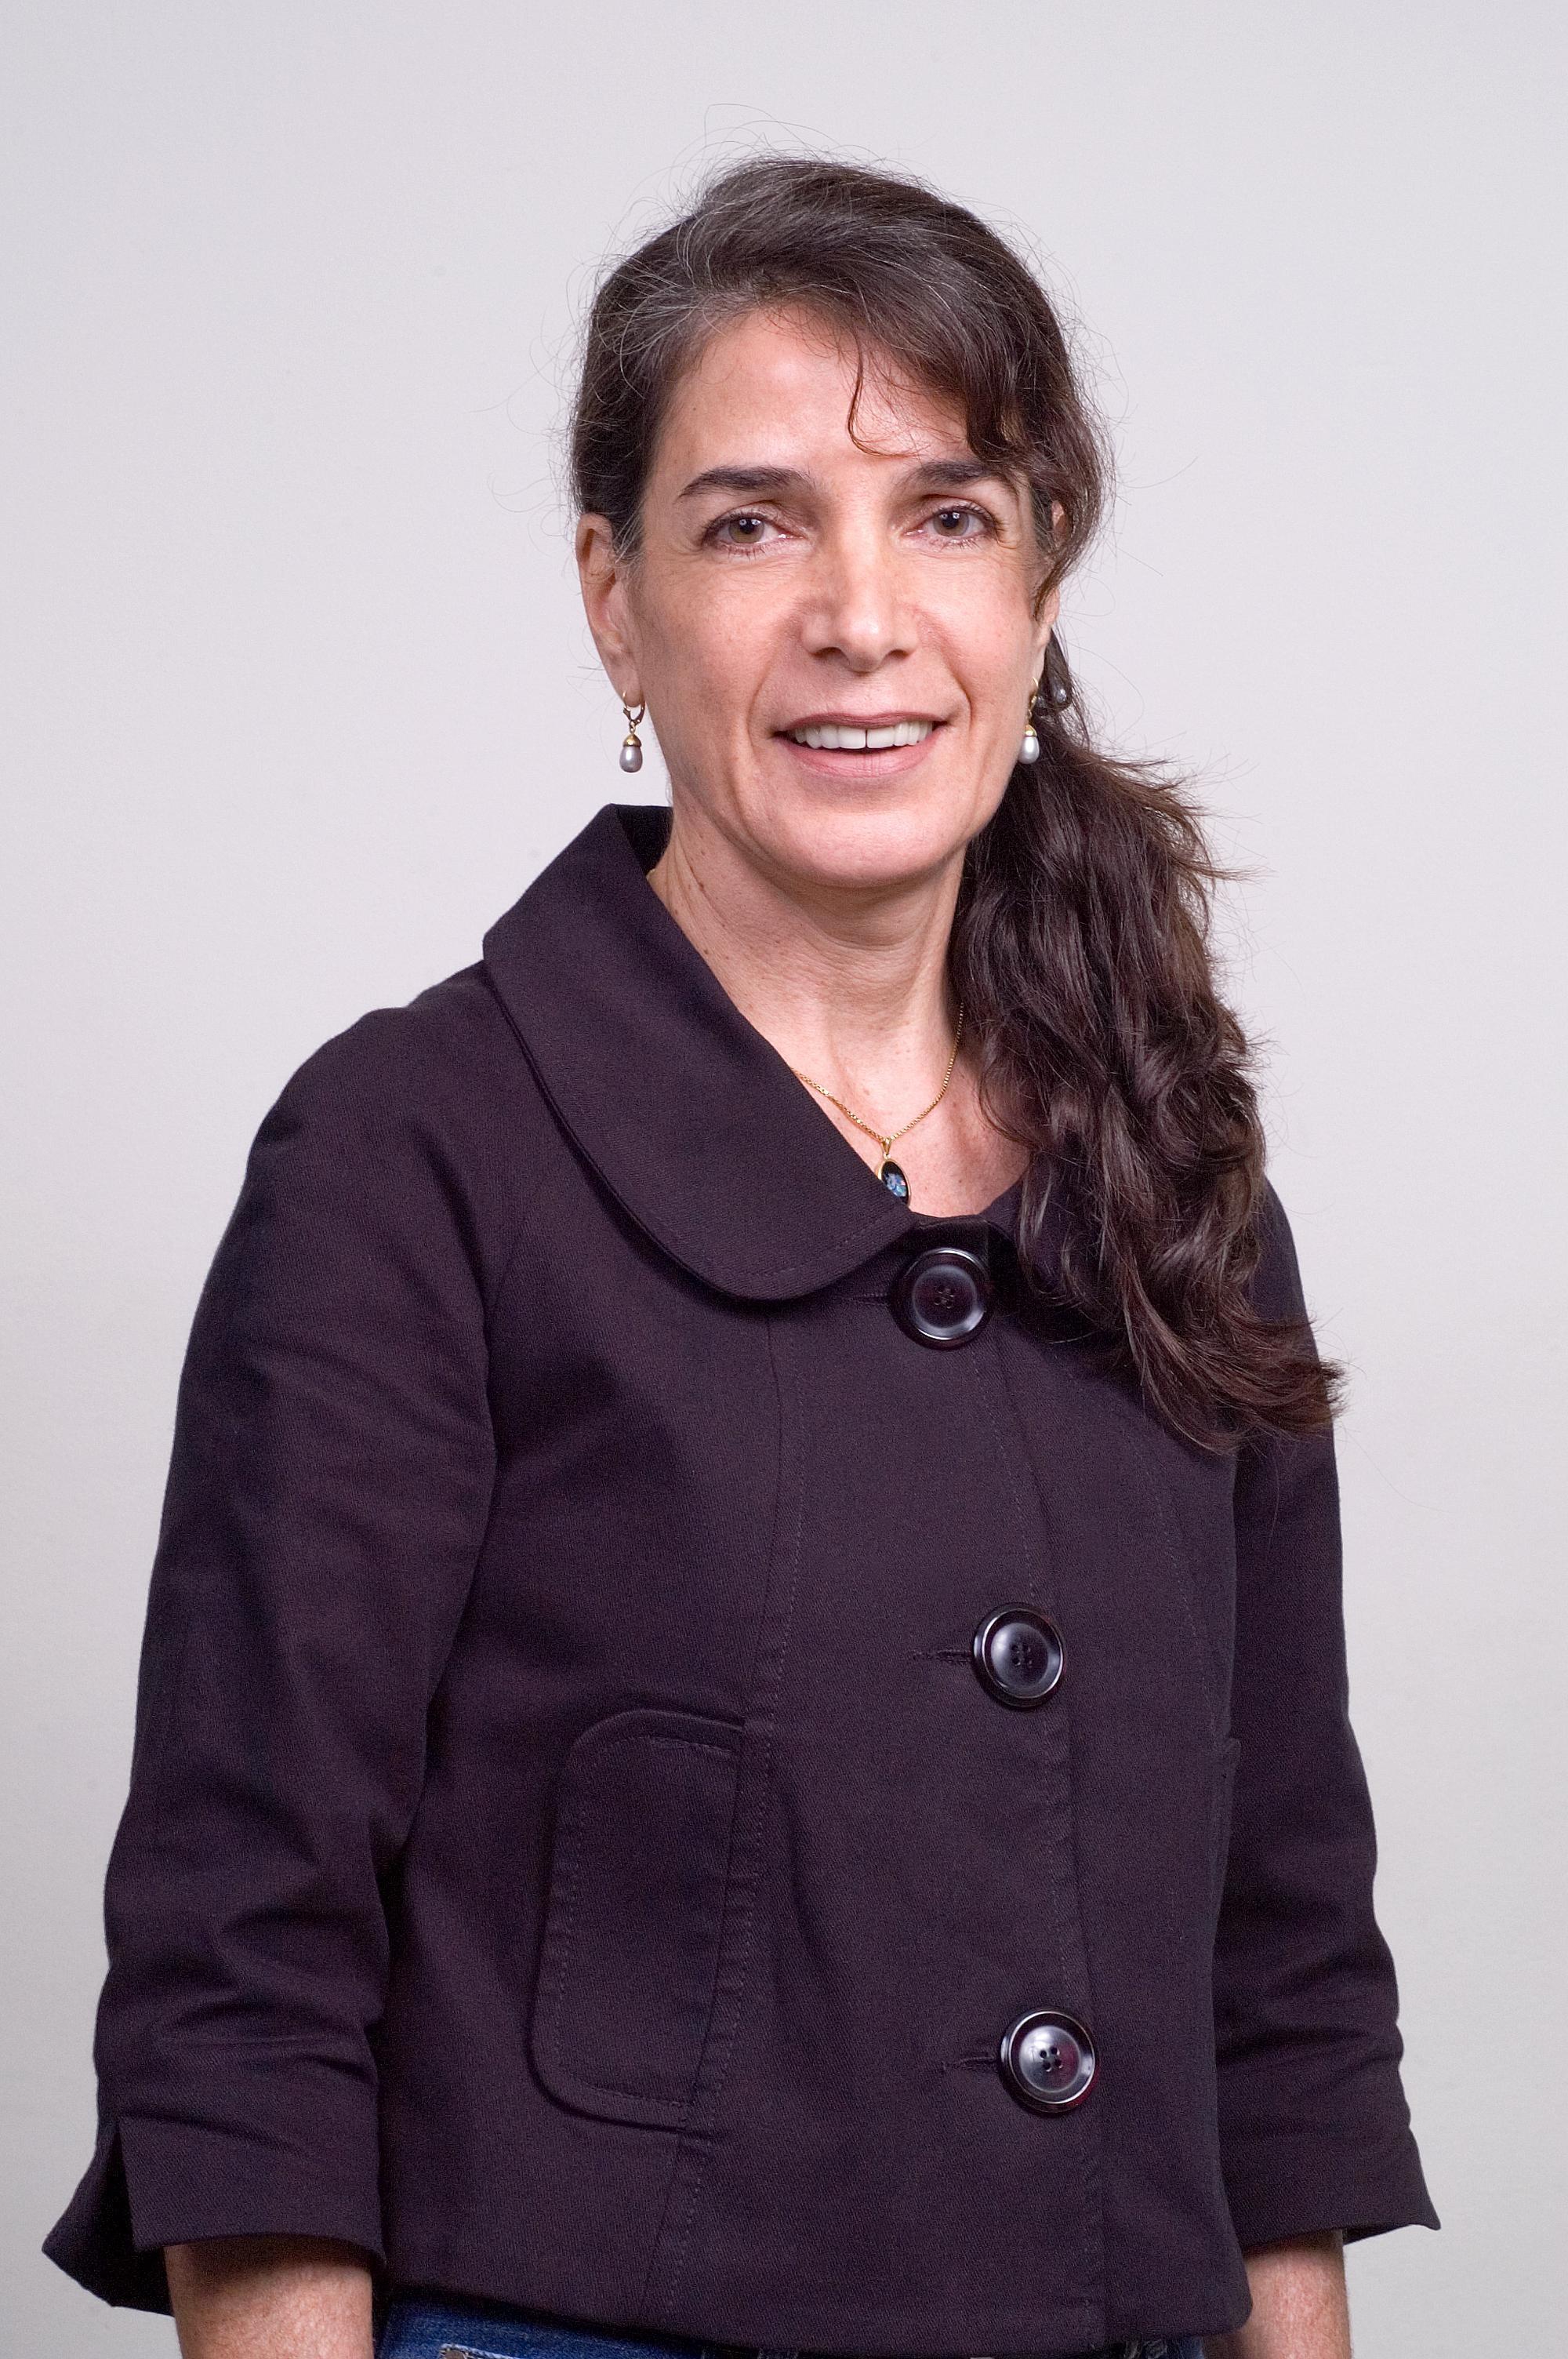 Marissa Consiglieri de Chackal